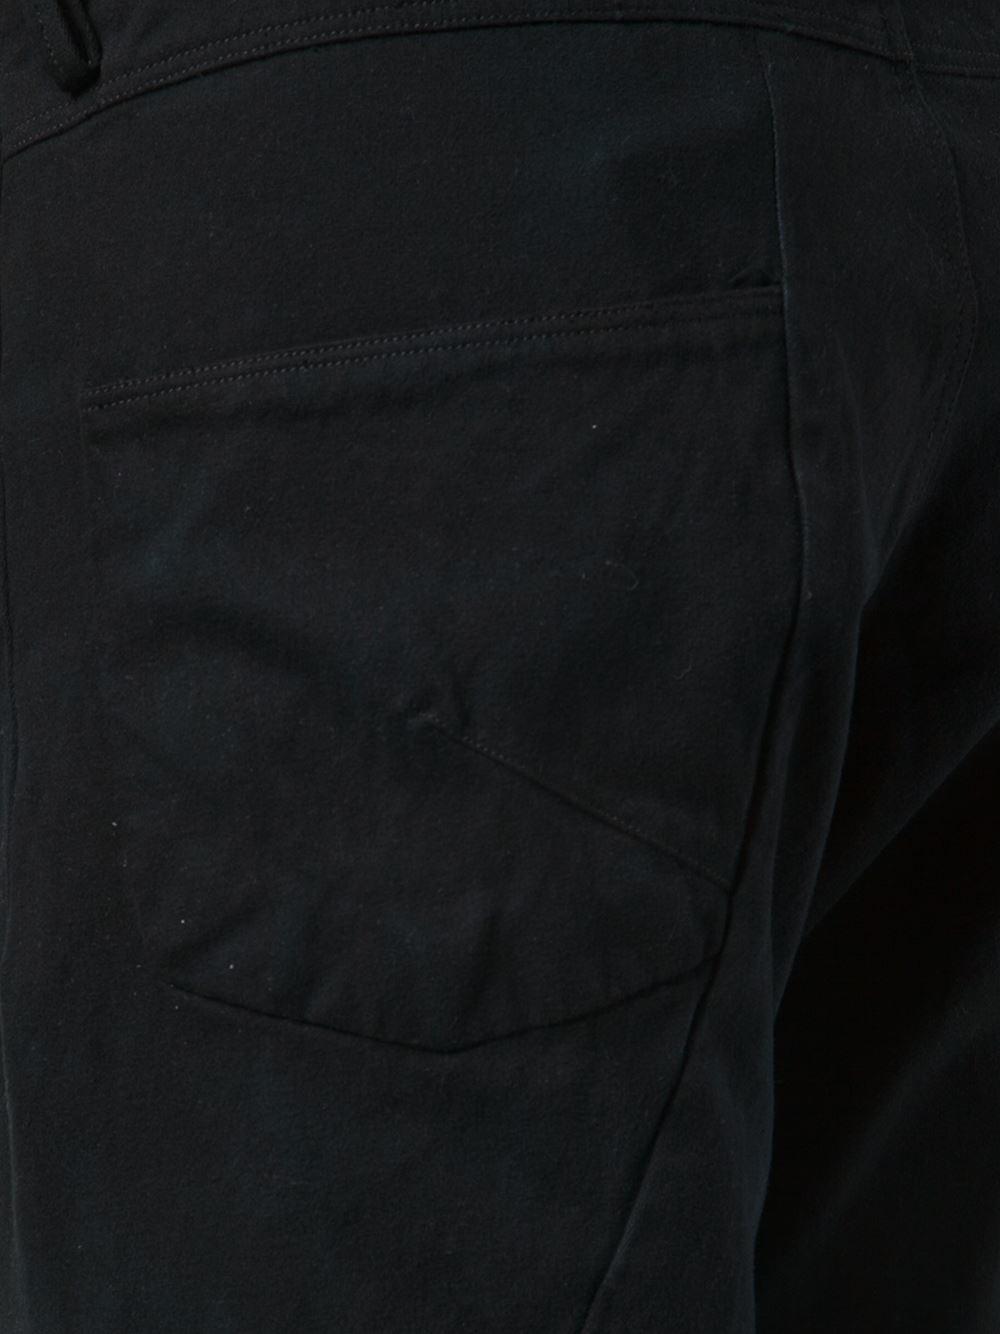 Zam Barrett Denim 'minimalist' Jeans in Blue for Men